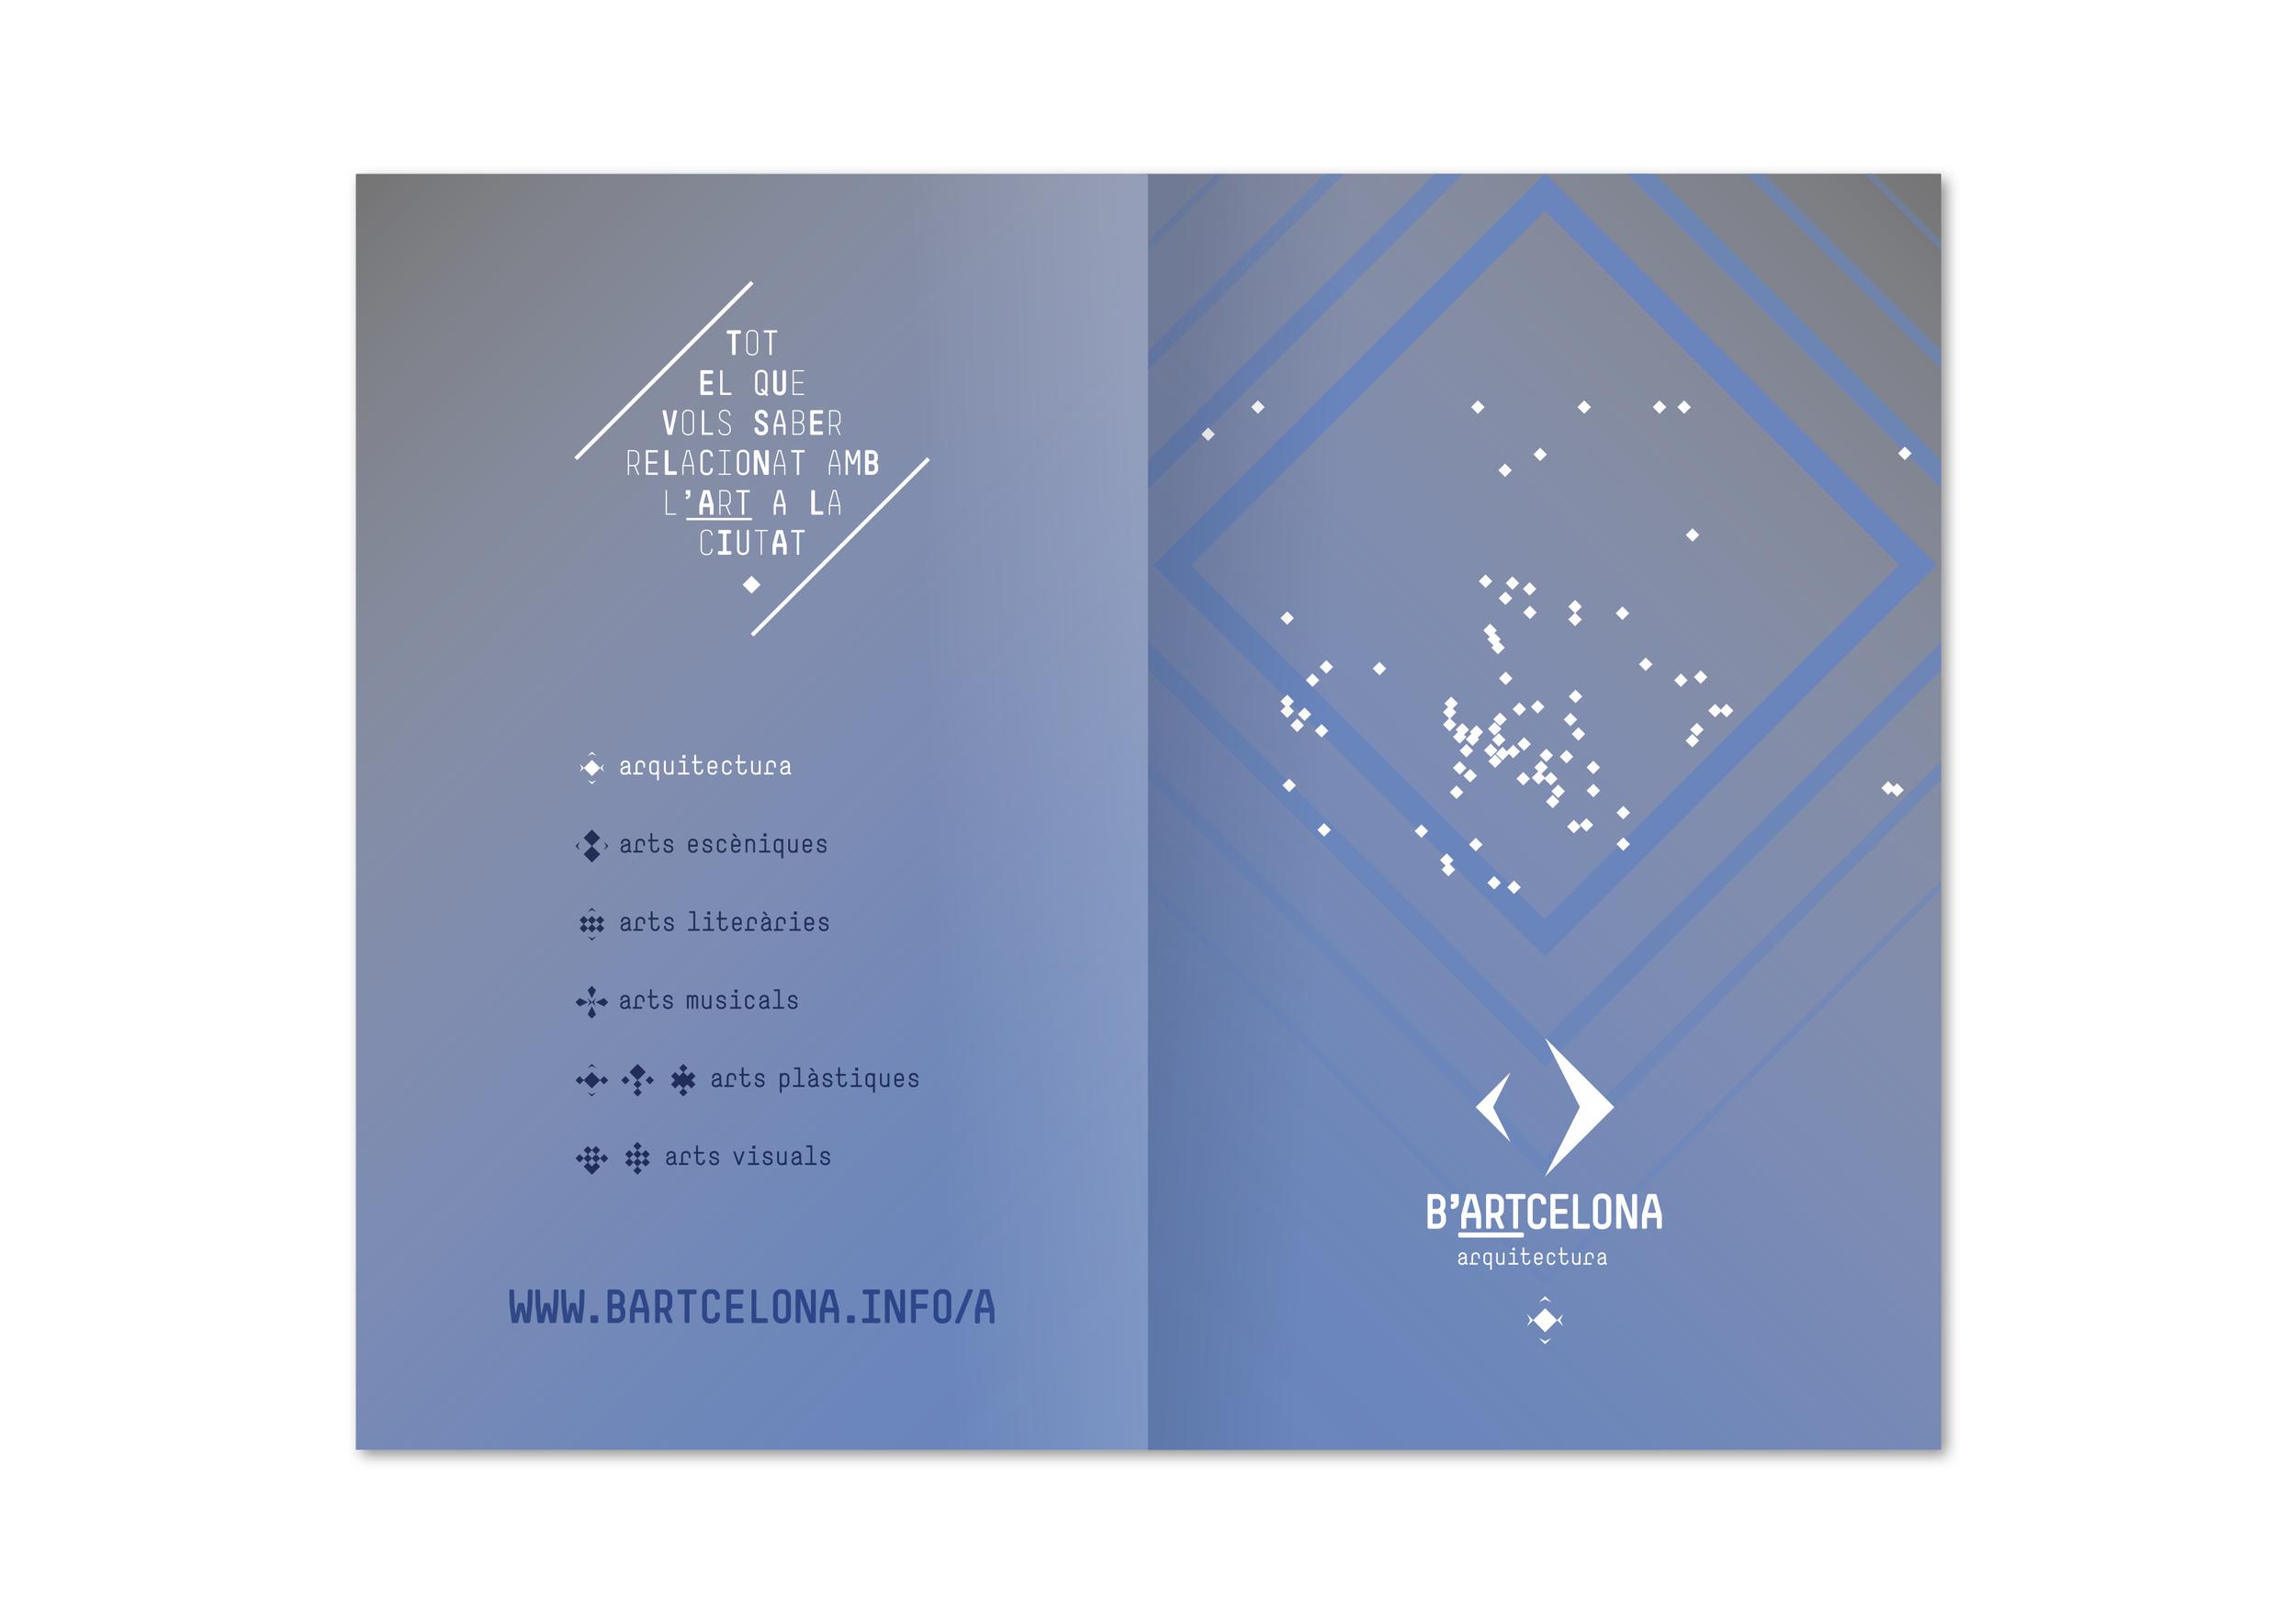 bartcelona_cover_bk1_victorgc.png